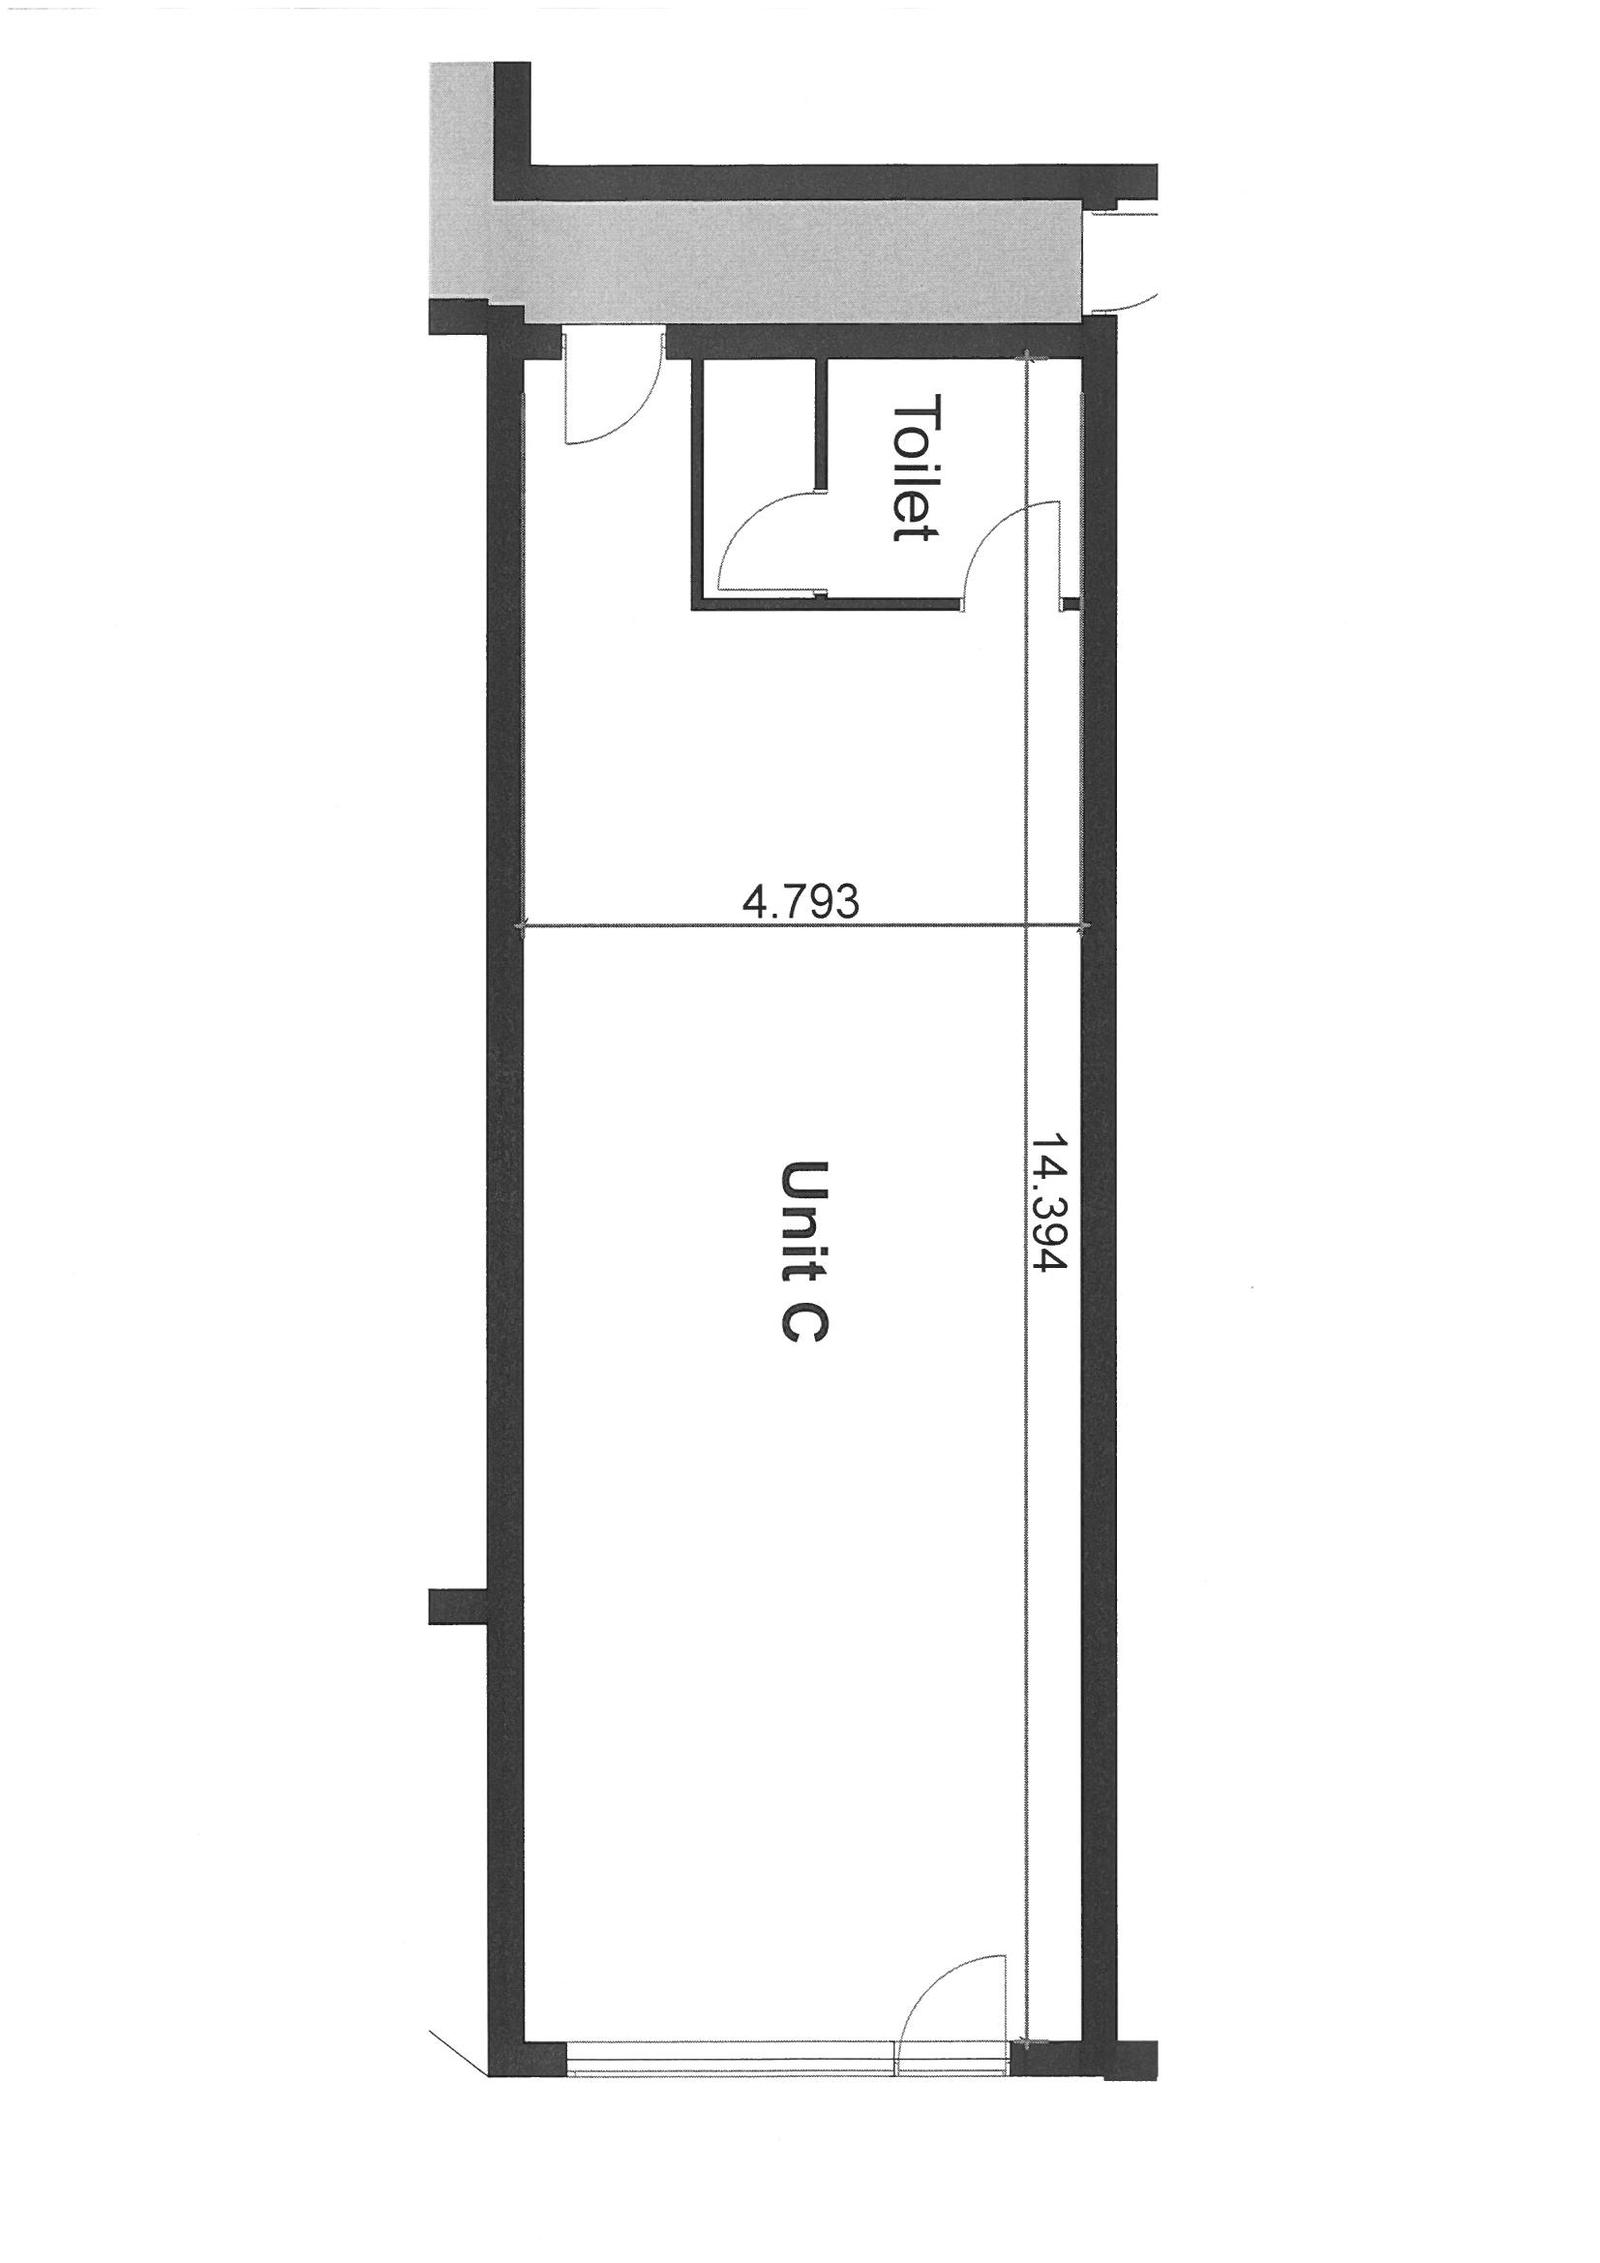 Unit C, Tower Commercial Centre, Monastery Road, Clondalkin, Dublin 22